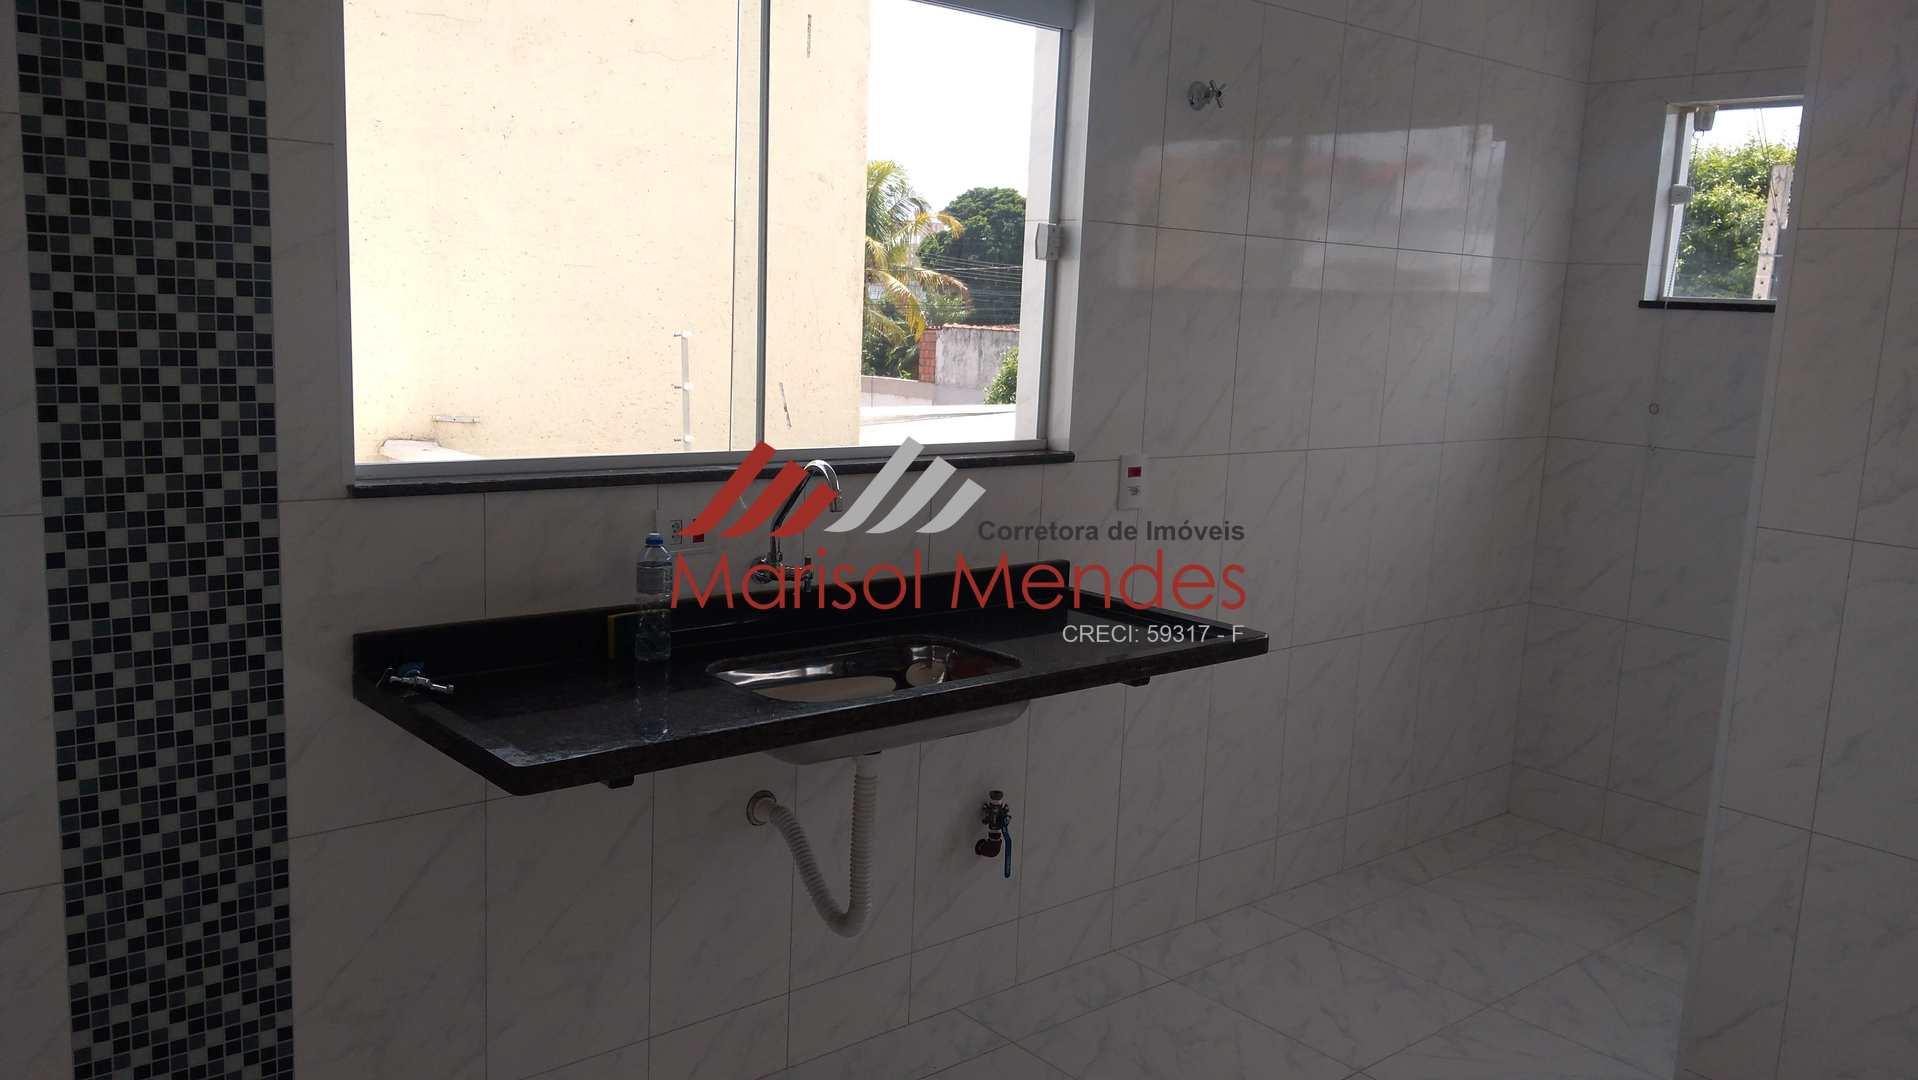 Apartamento com 3 dorms, Jardim Carlos Gomes, Pirassununga - R$ 350 mil, Cod: 66